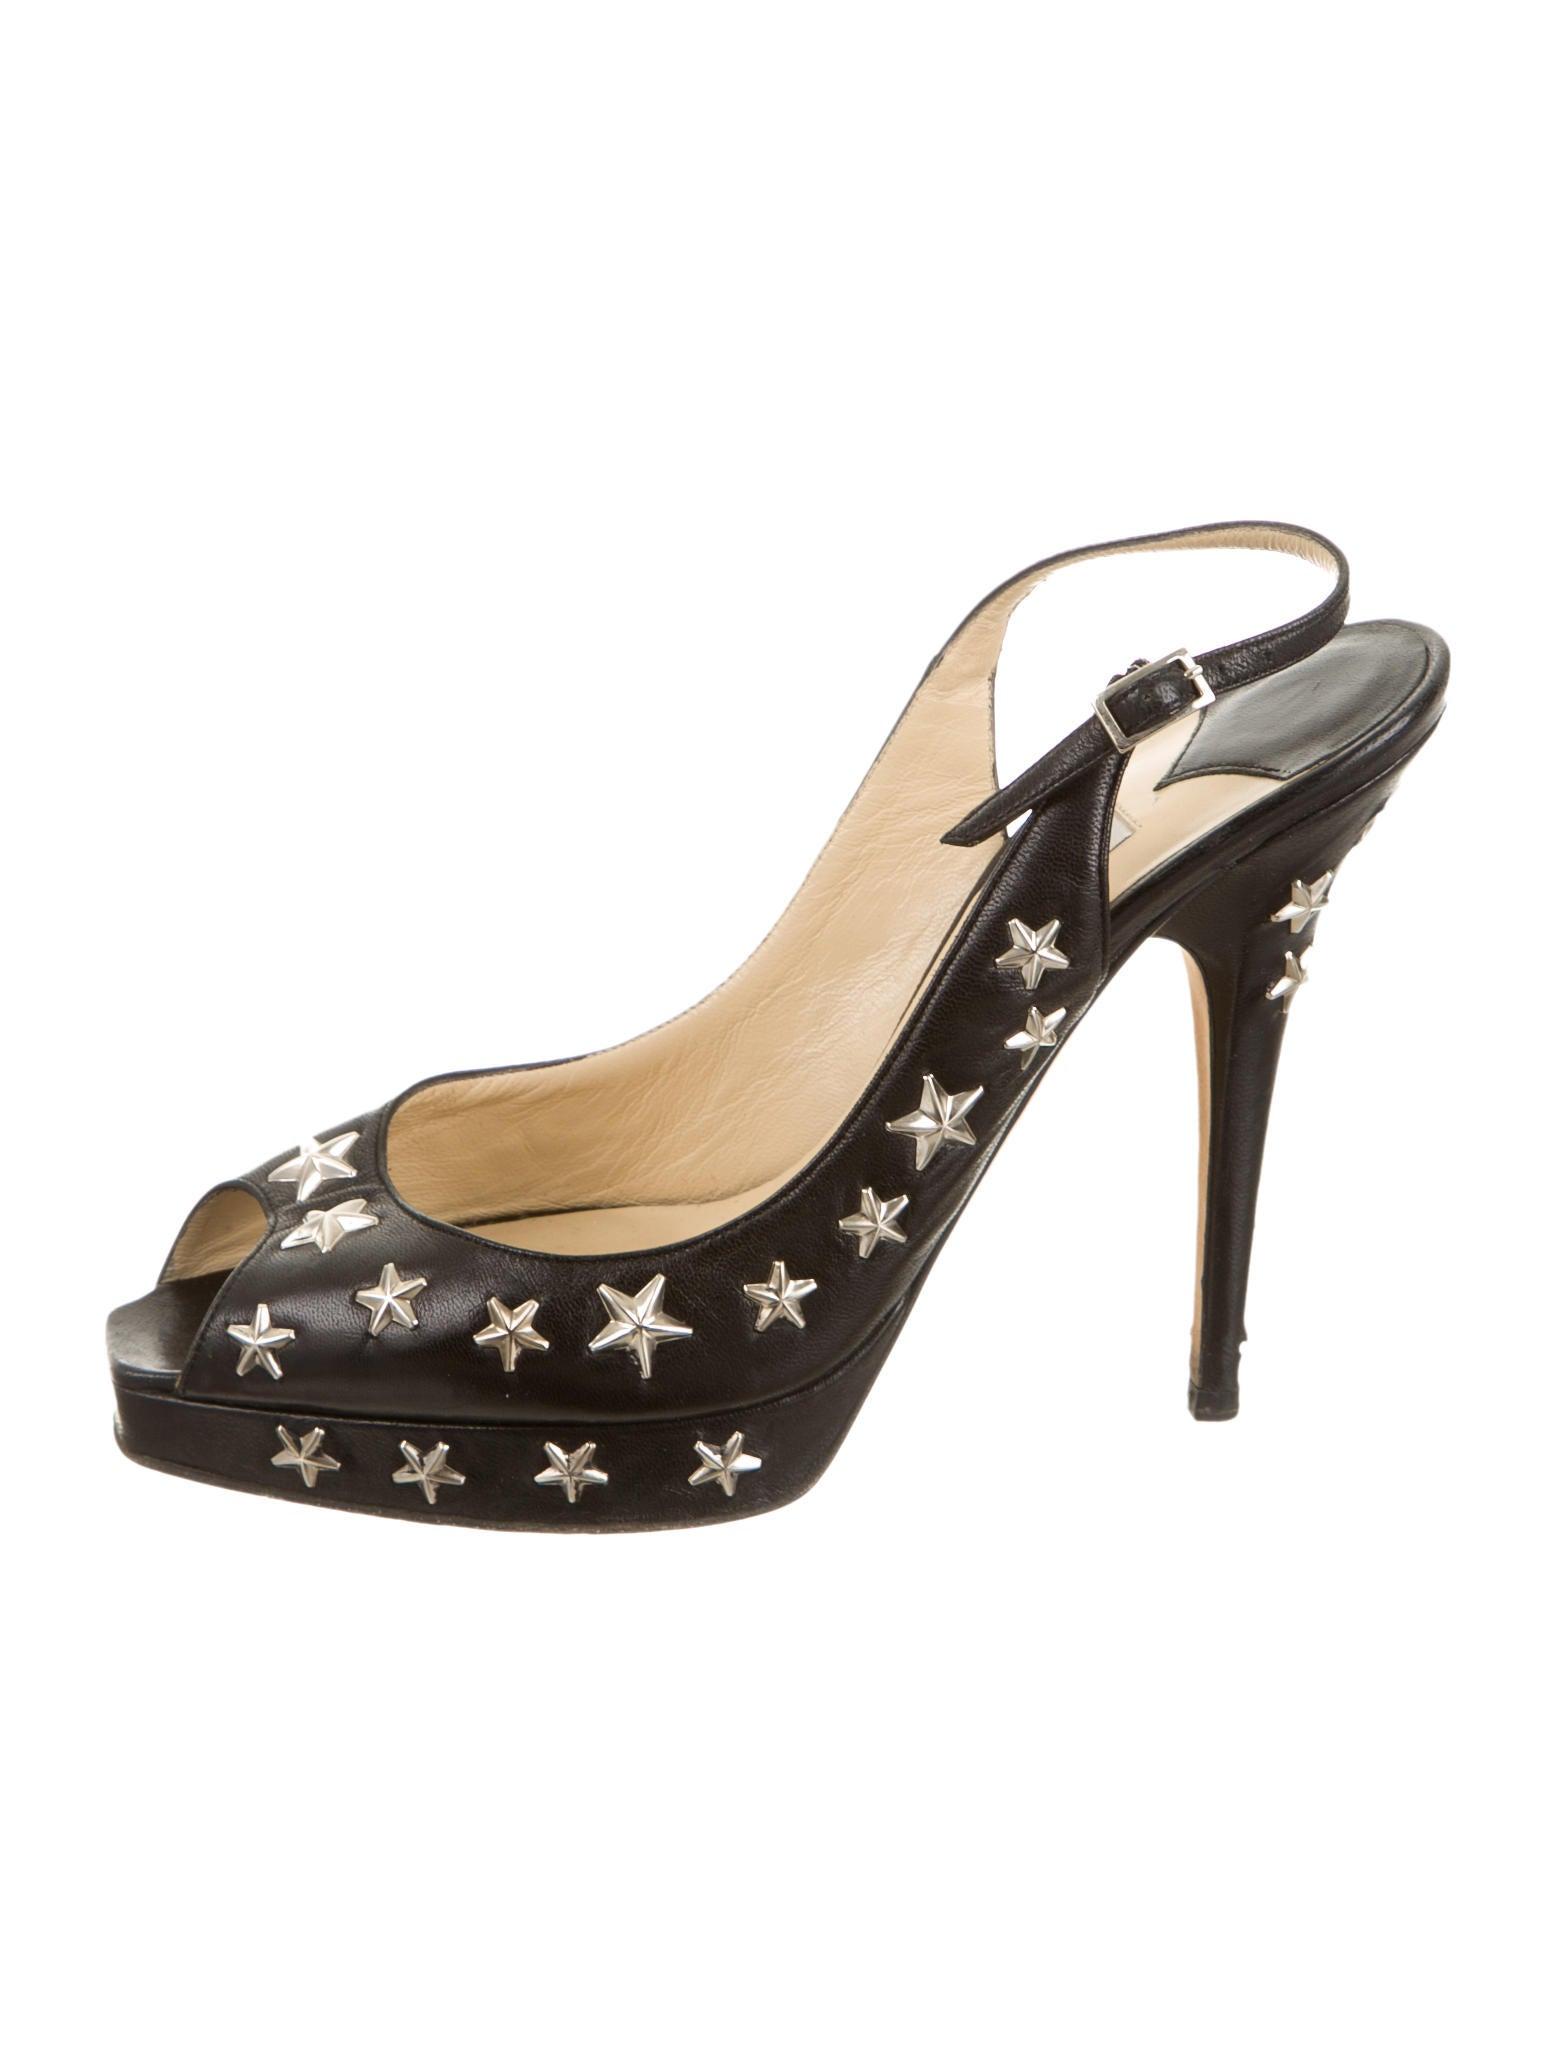 jimmy choo pumps shoes jim36432 the realreal